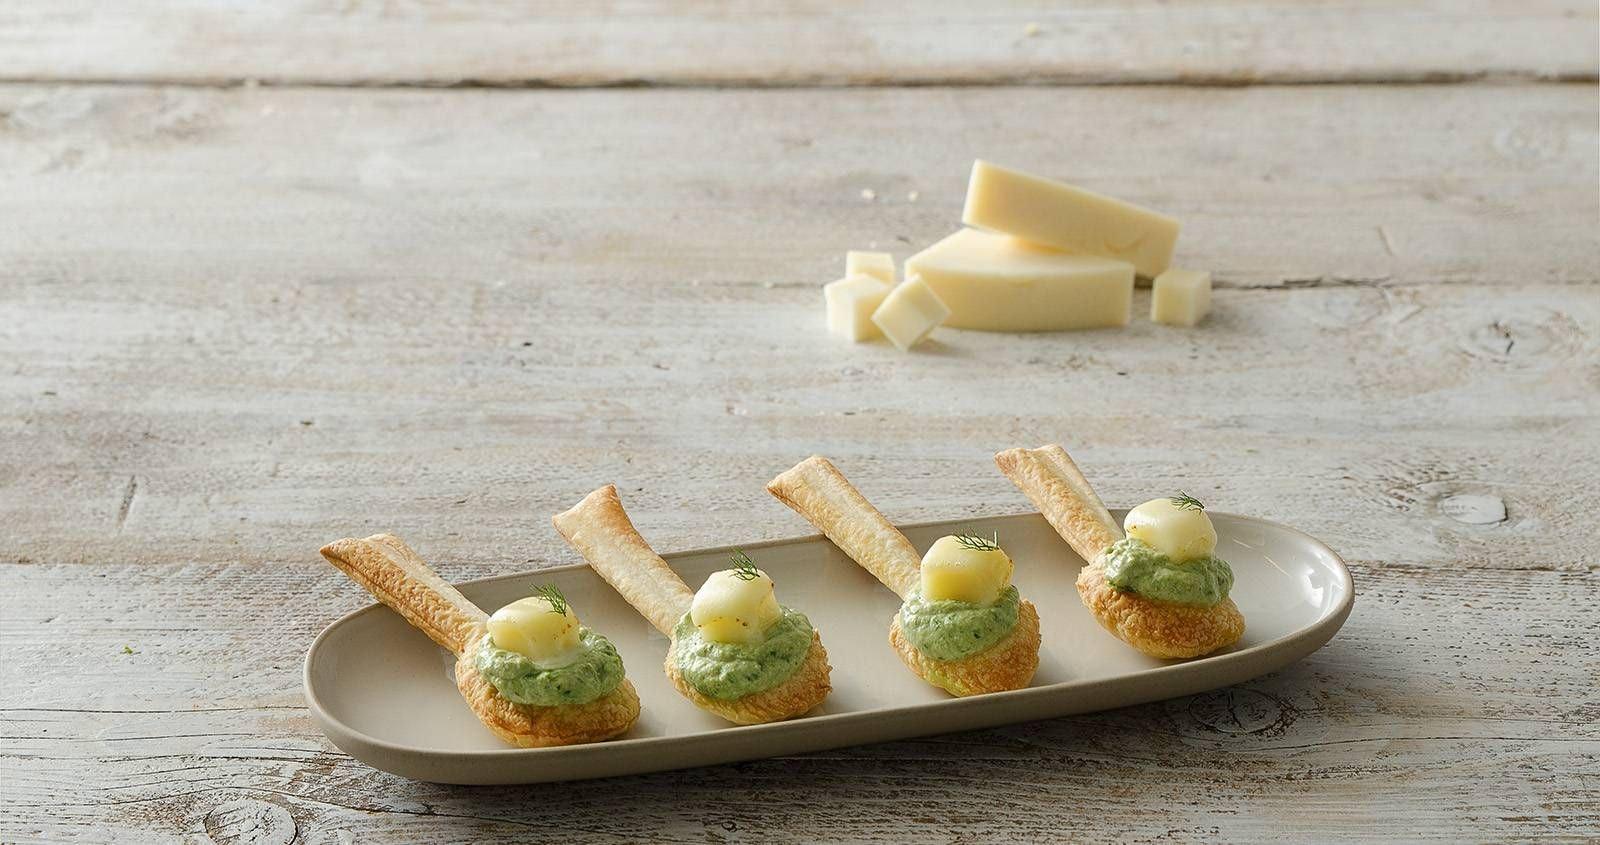 Cucchiaini di Pasta Sfoglia - Parmalat